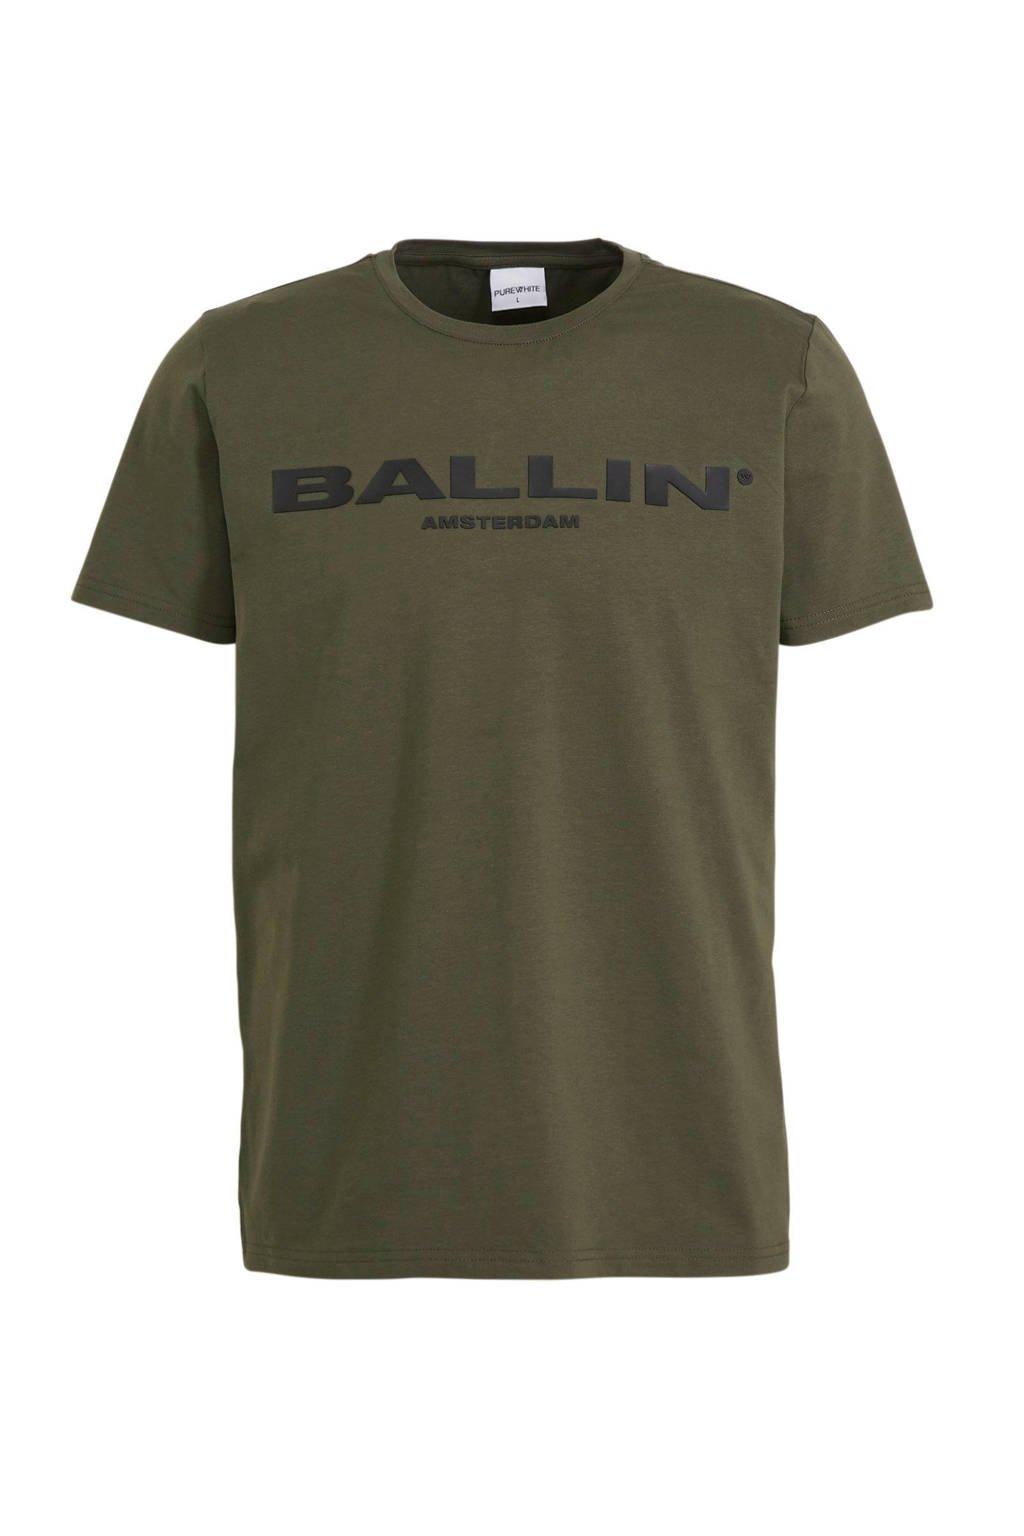 Ballin T-shirt met logo donkergroen, Groen